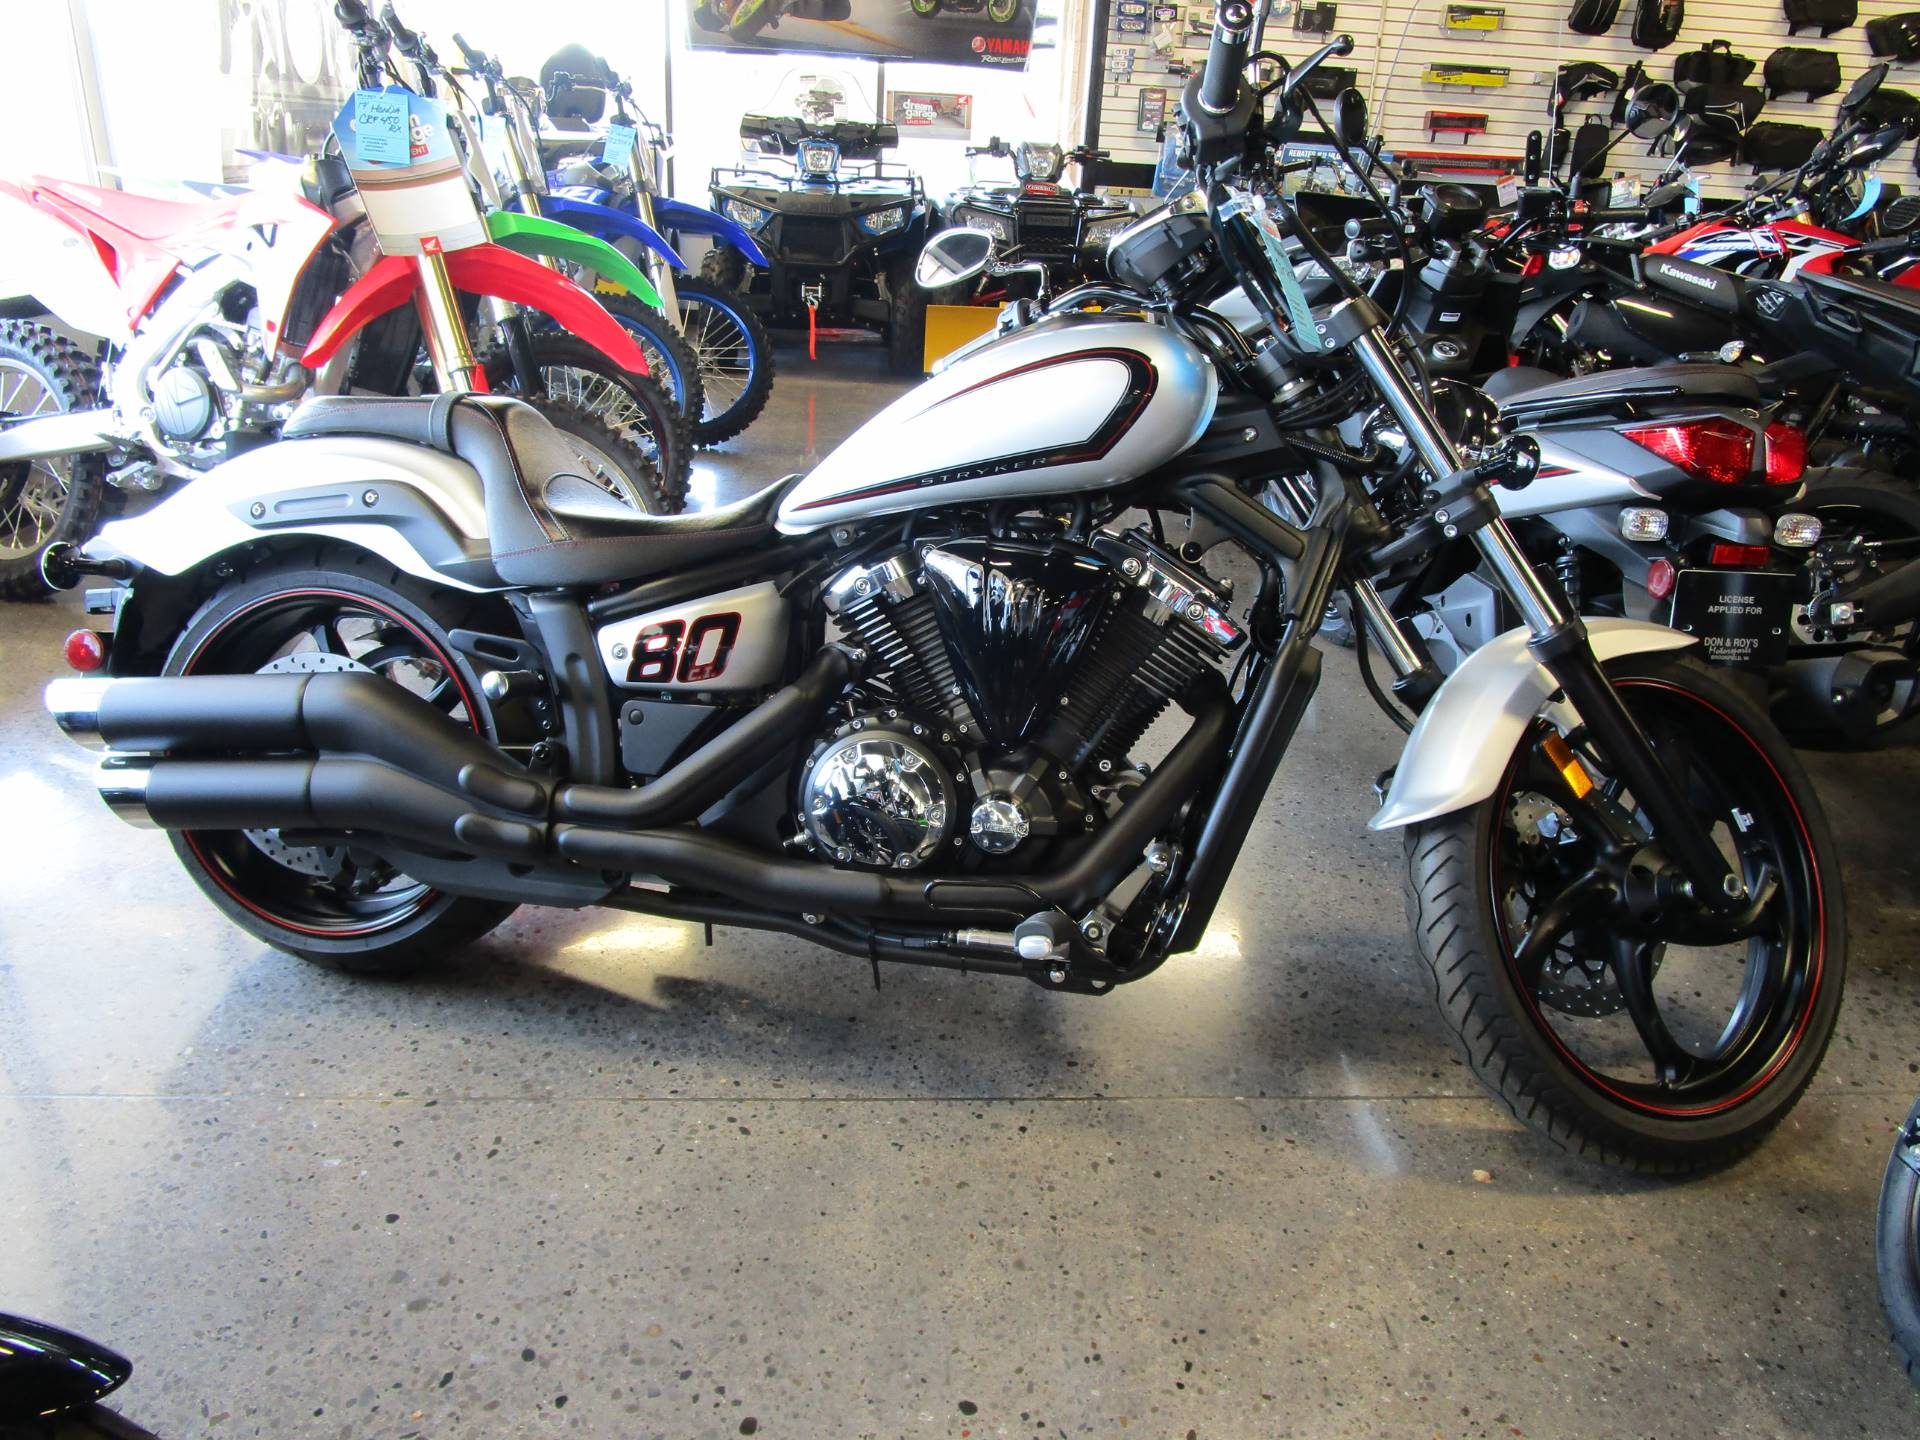 2015 Yamaha Stryker for sale 63594